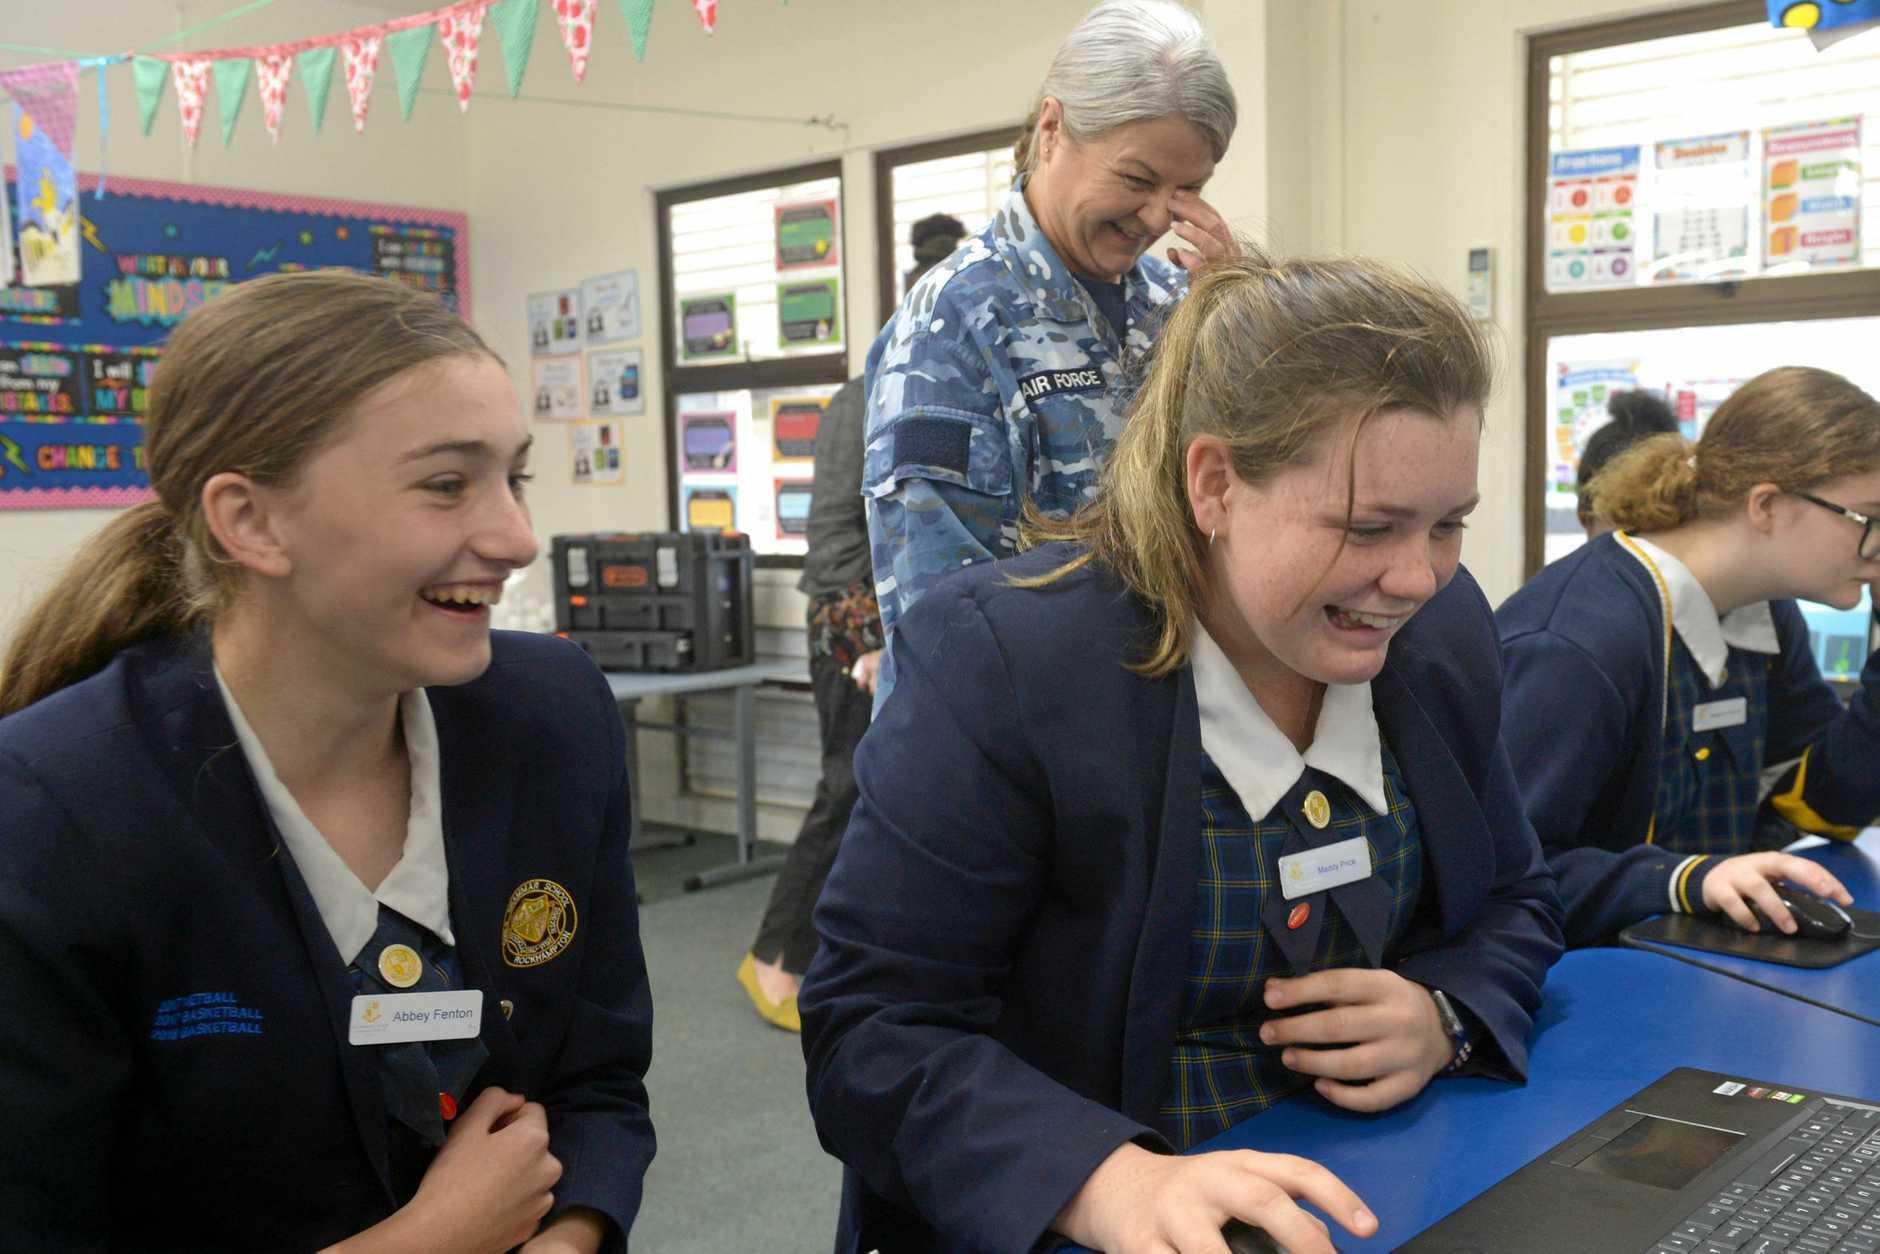 Abbey Fenton, Flight Lt Kylie Willmott and Maddy Price on the air traffic control simulator at Rockhampton Girls Grammar School